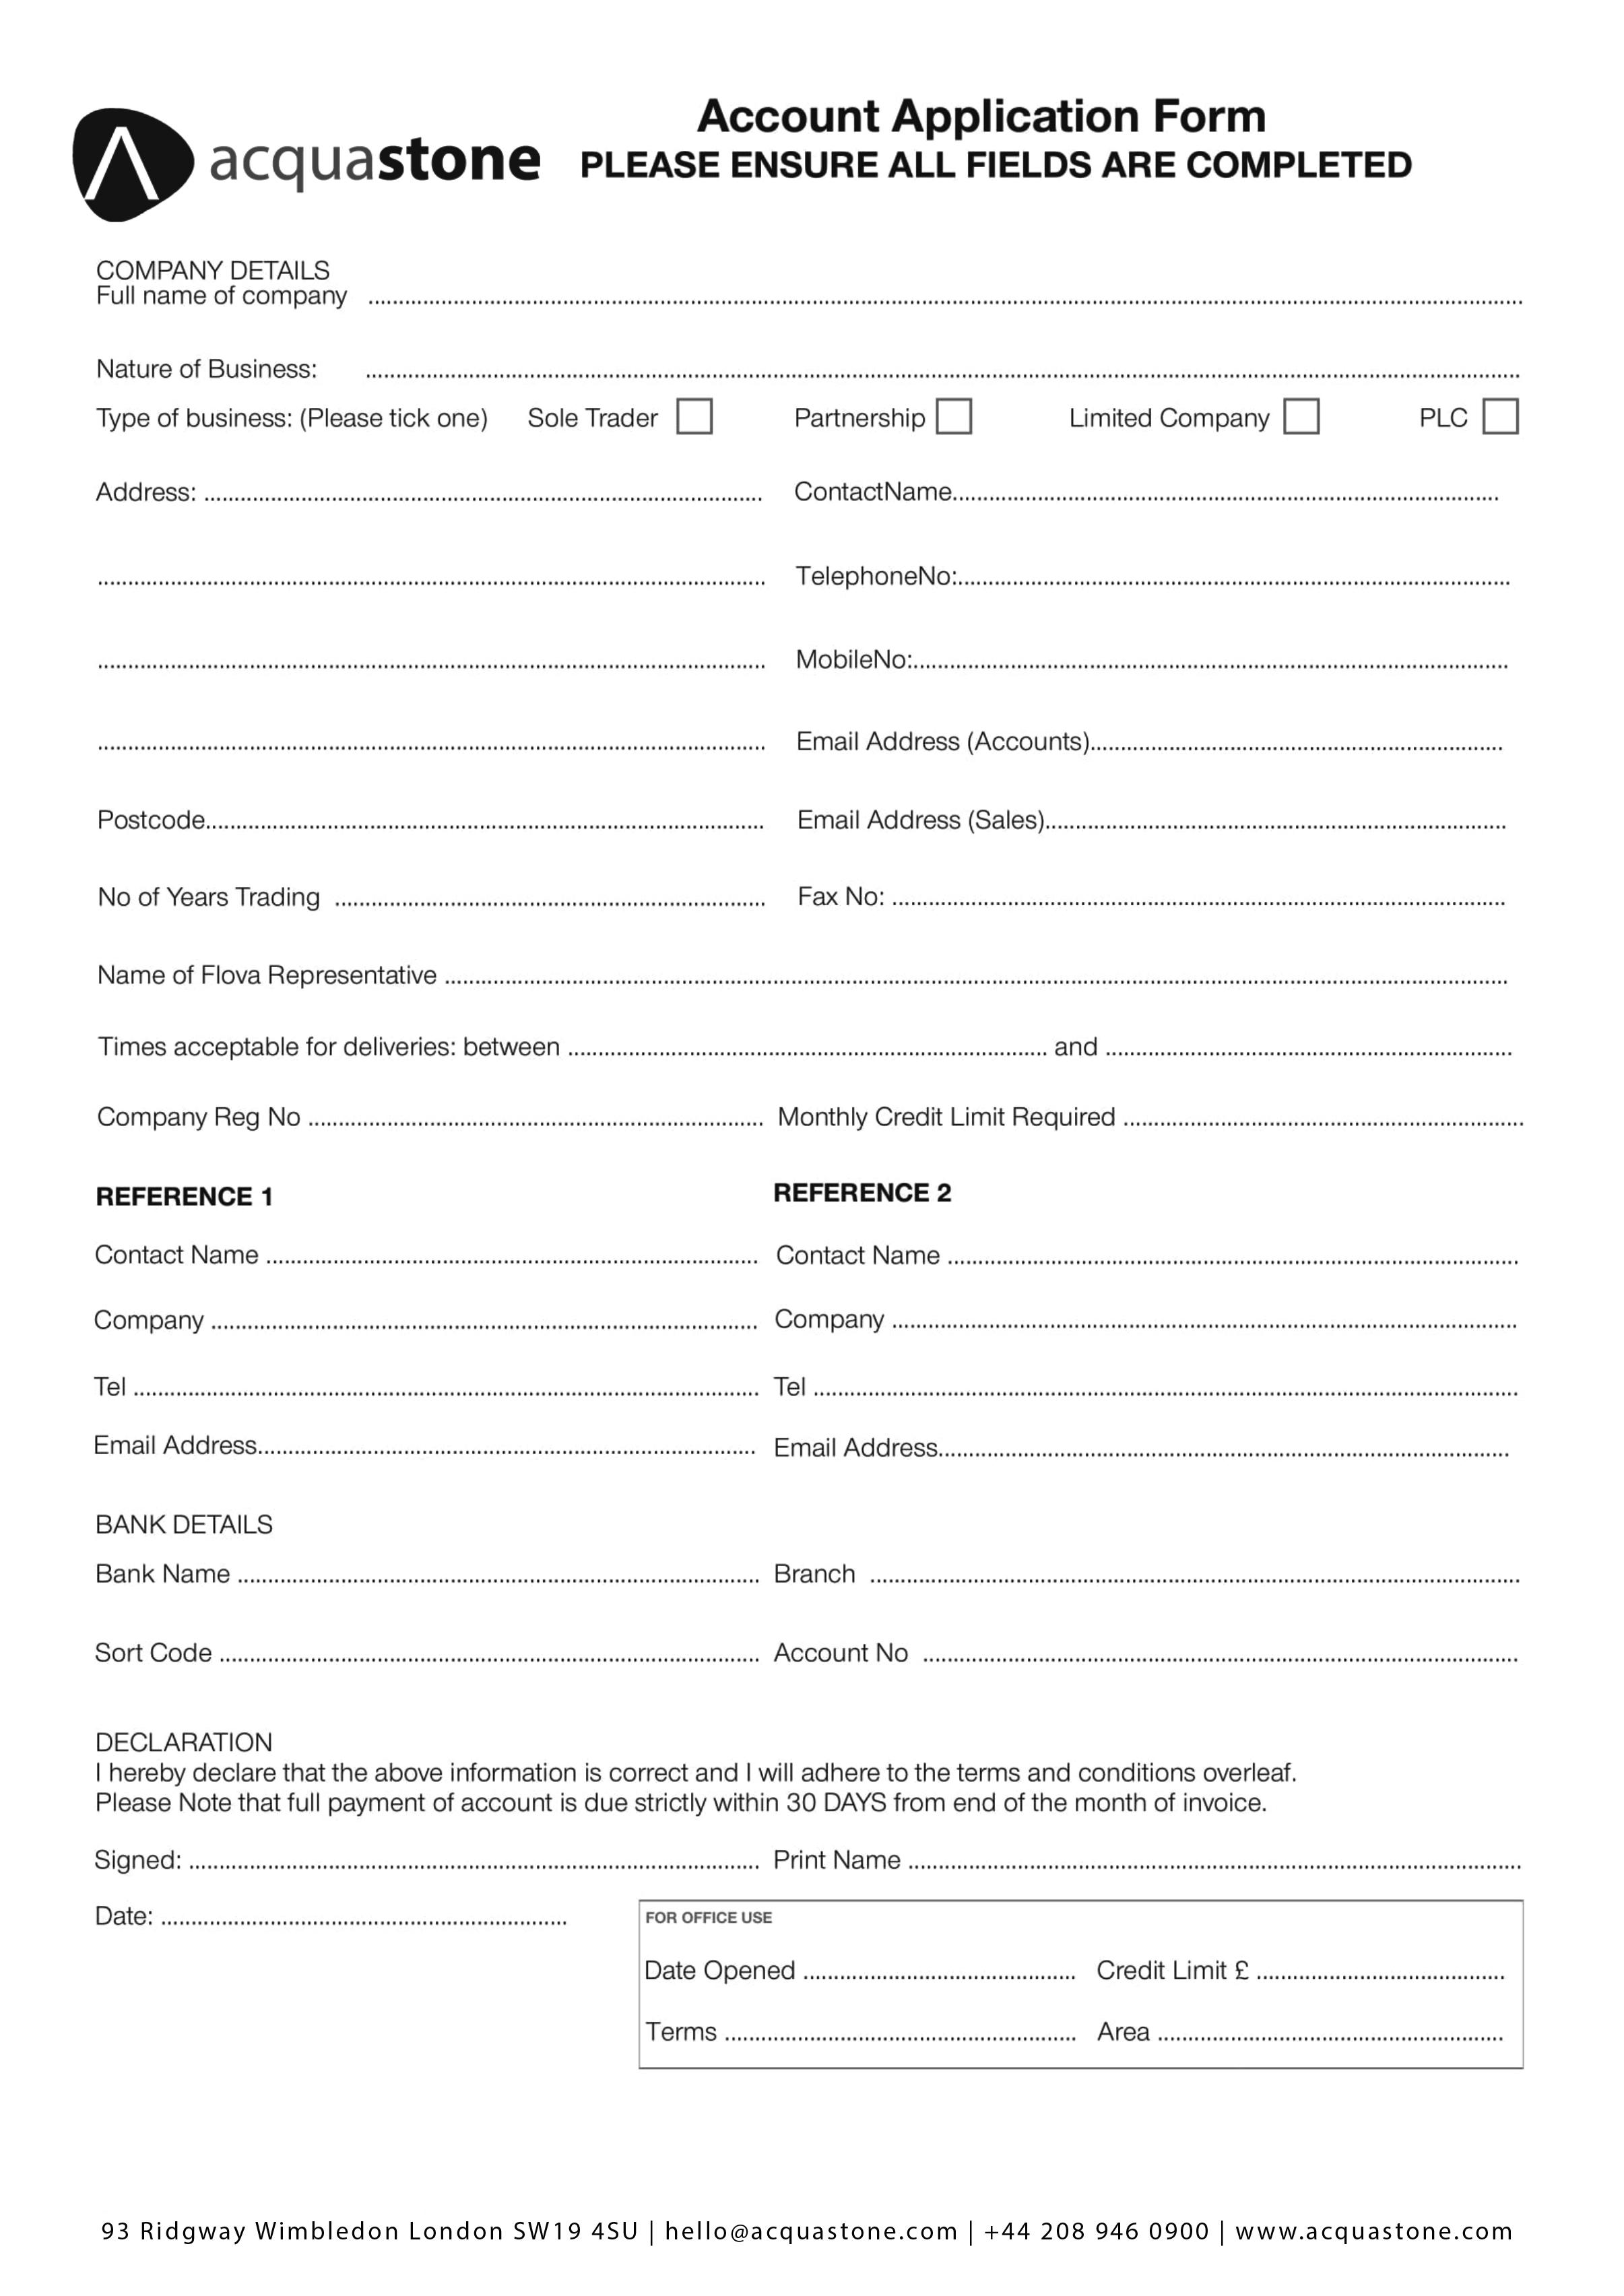 Trade Account Application - By Acquastone